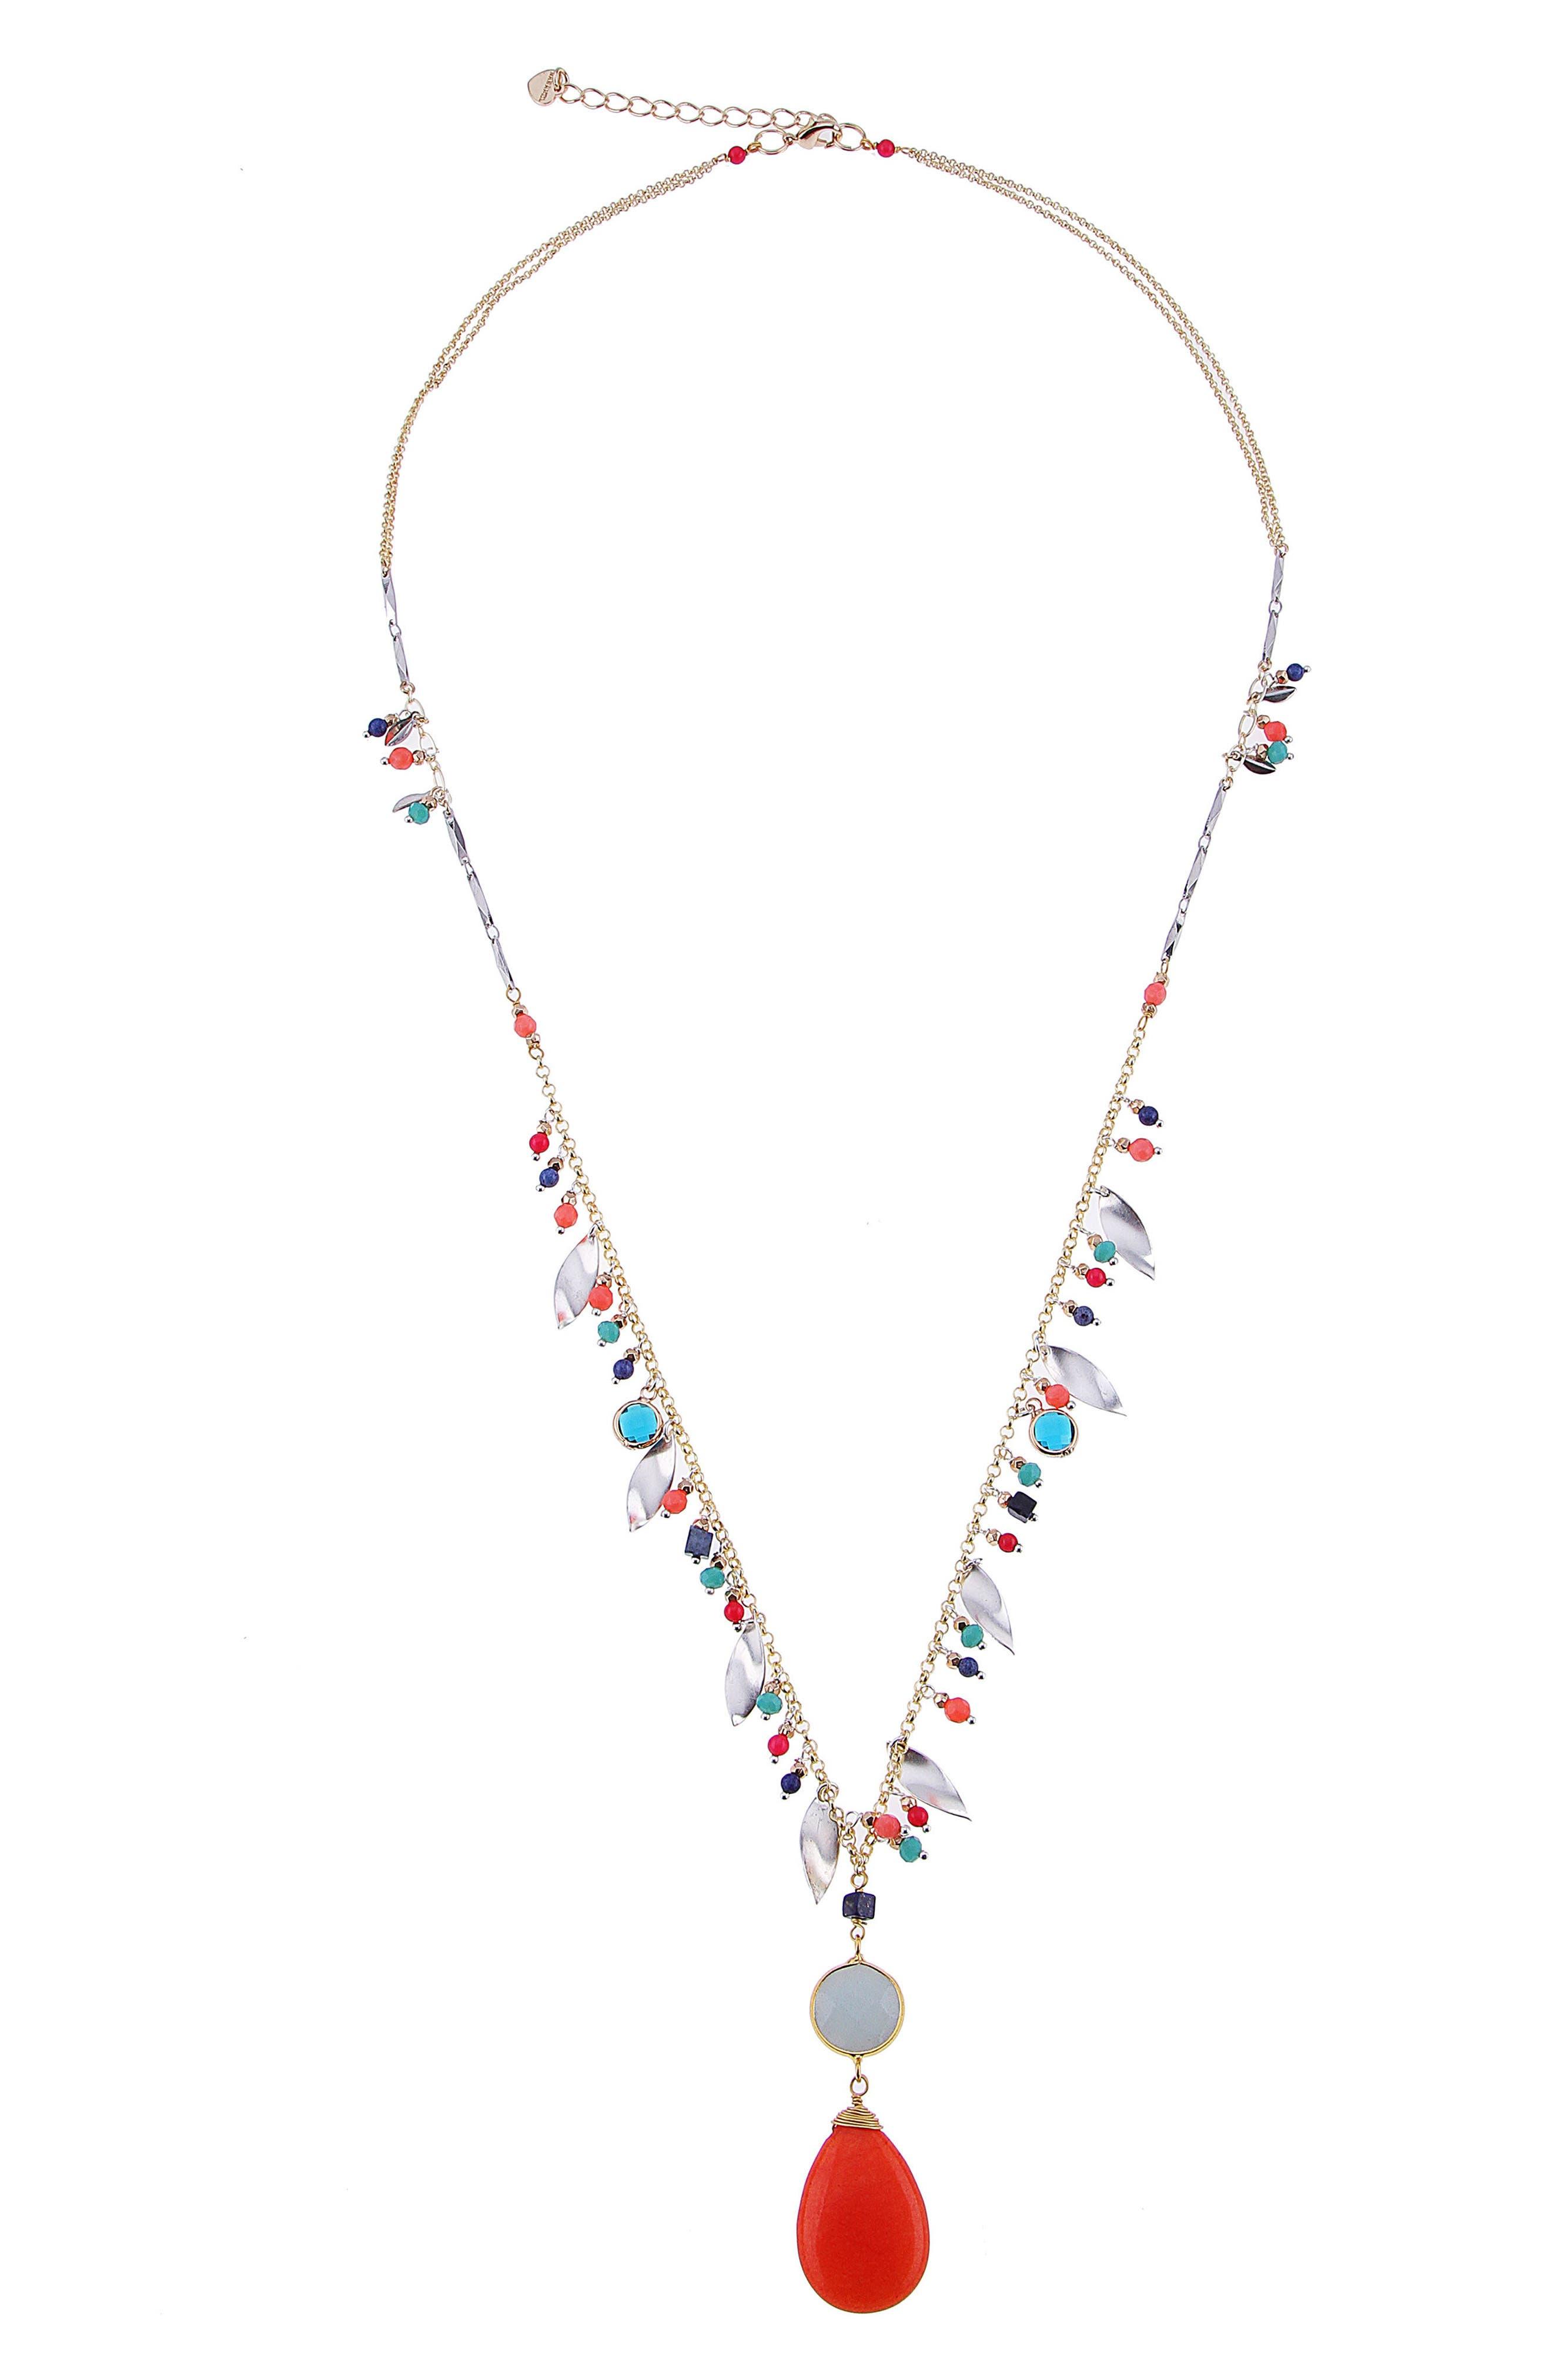 Tiny Stone Agate Pendant Necklace,                             Main thumbnail 1, color,                             800